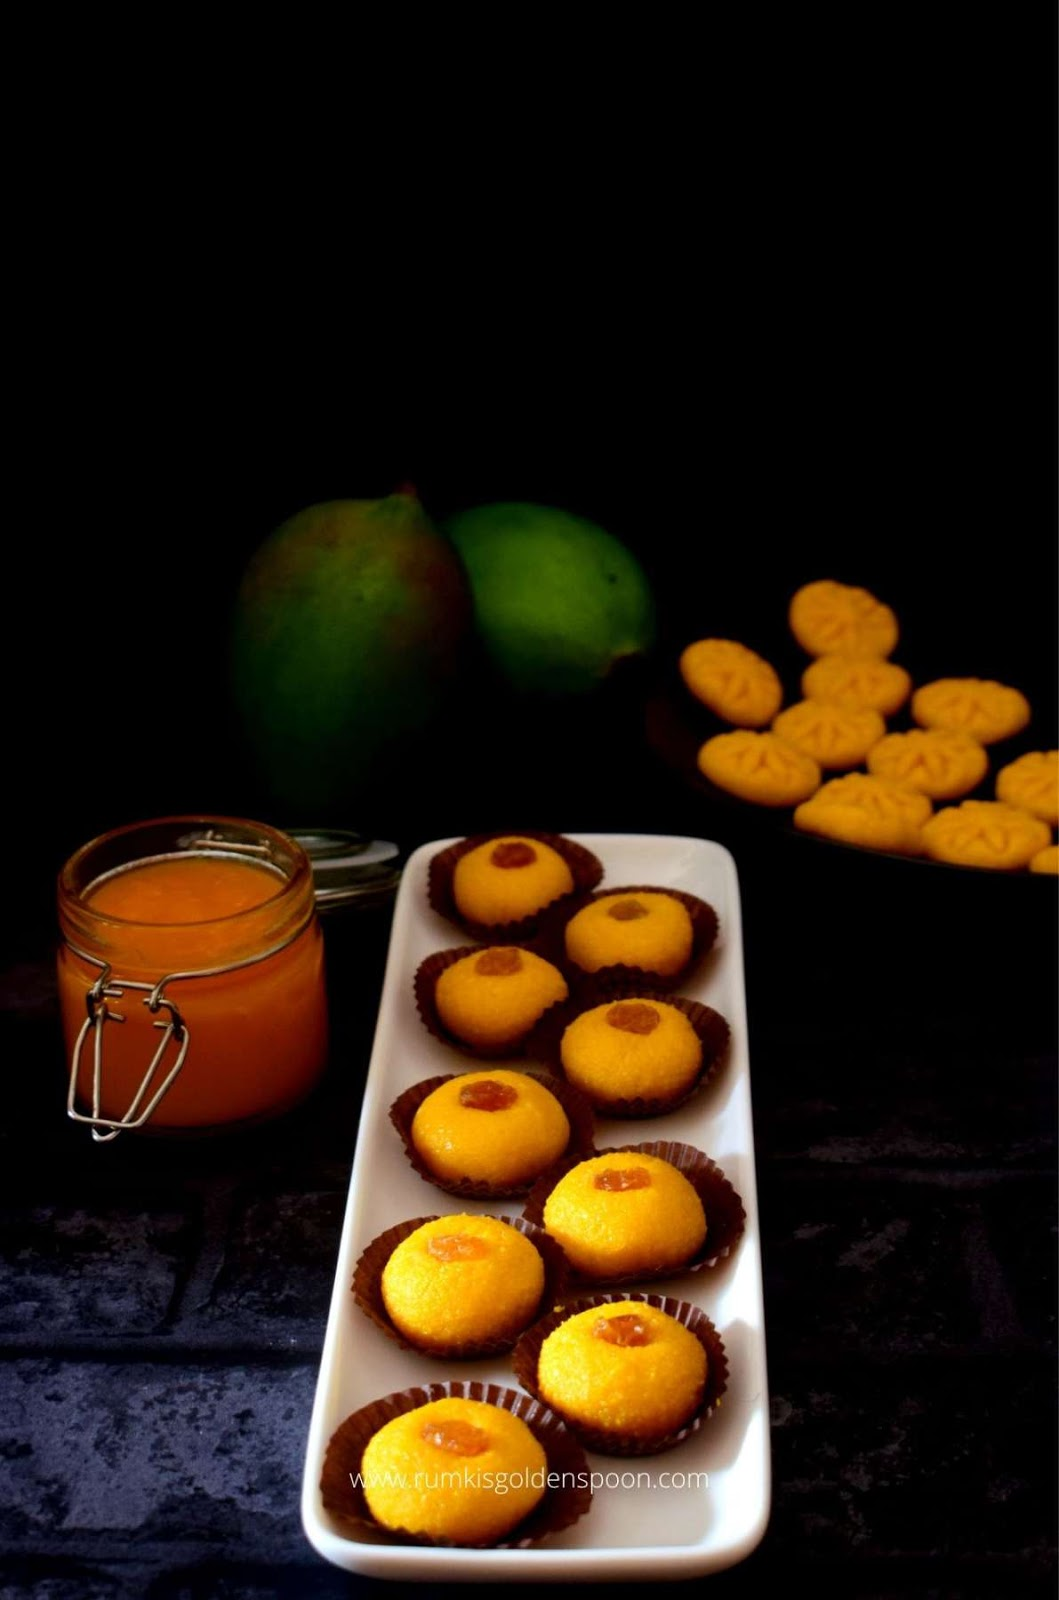 mango Sandesh, aam Sandesh, mango sandesh recipe, mango pulp Sandesh, mango Sandesh at home, mango Sandesh Bengali recipe, mango dessert, mango dessert recipes, mango dessert recipe, mango recipes dessert, how to make mango Sandesh, recipe of mango Sandesh, recipe for mango Sandesh, Sandesh recipe, Sandesh recipes, recipe for Sandesh, recipe of Sandesh, Sandesh sweet recipe, Bengali Sandesh recipe, Sandesh recipe Bengali, Bengali sweet recipes, traditional Bengali sweets, Indian mango dessert recipes, Indian dessert recipes with mango, Indian dessert with mango, indian sweet recipes, Rumki's Golden Spoon